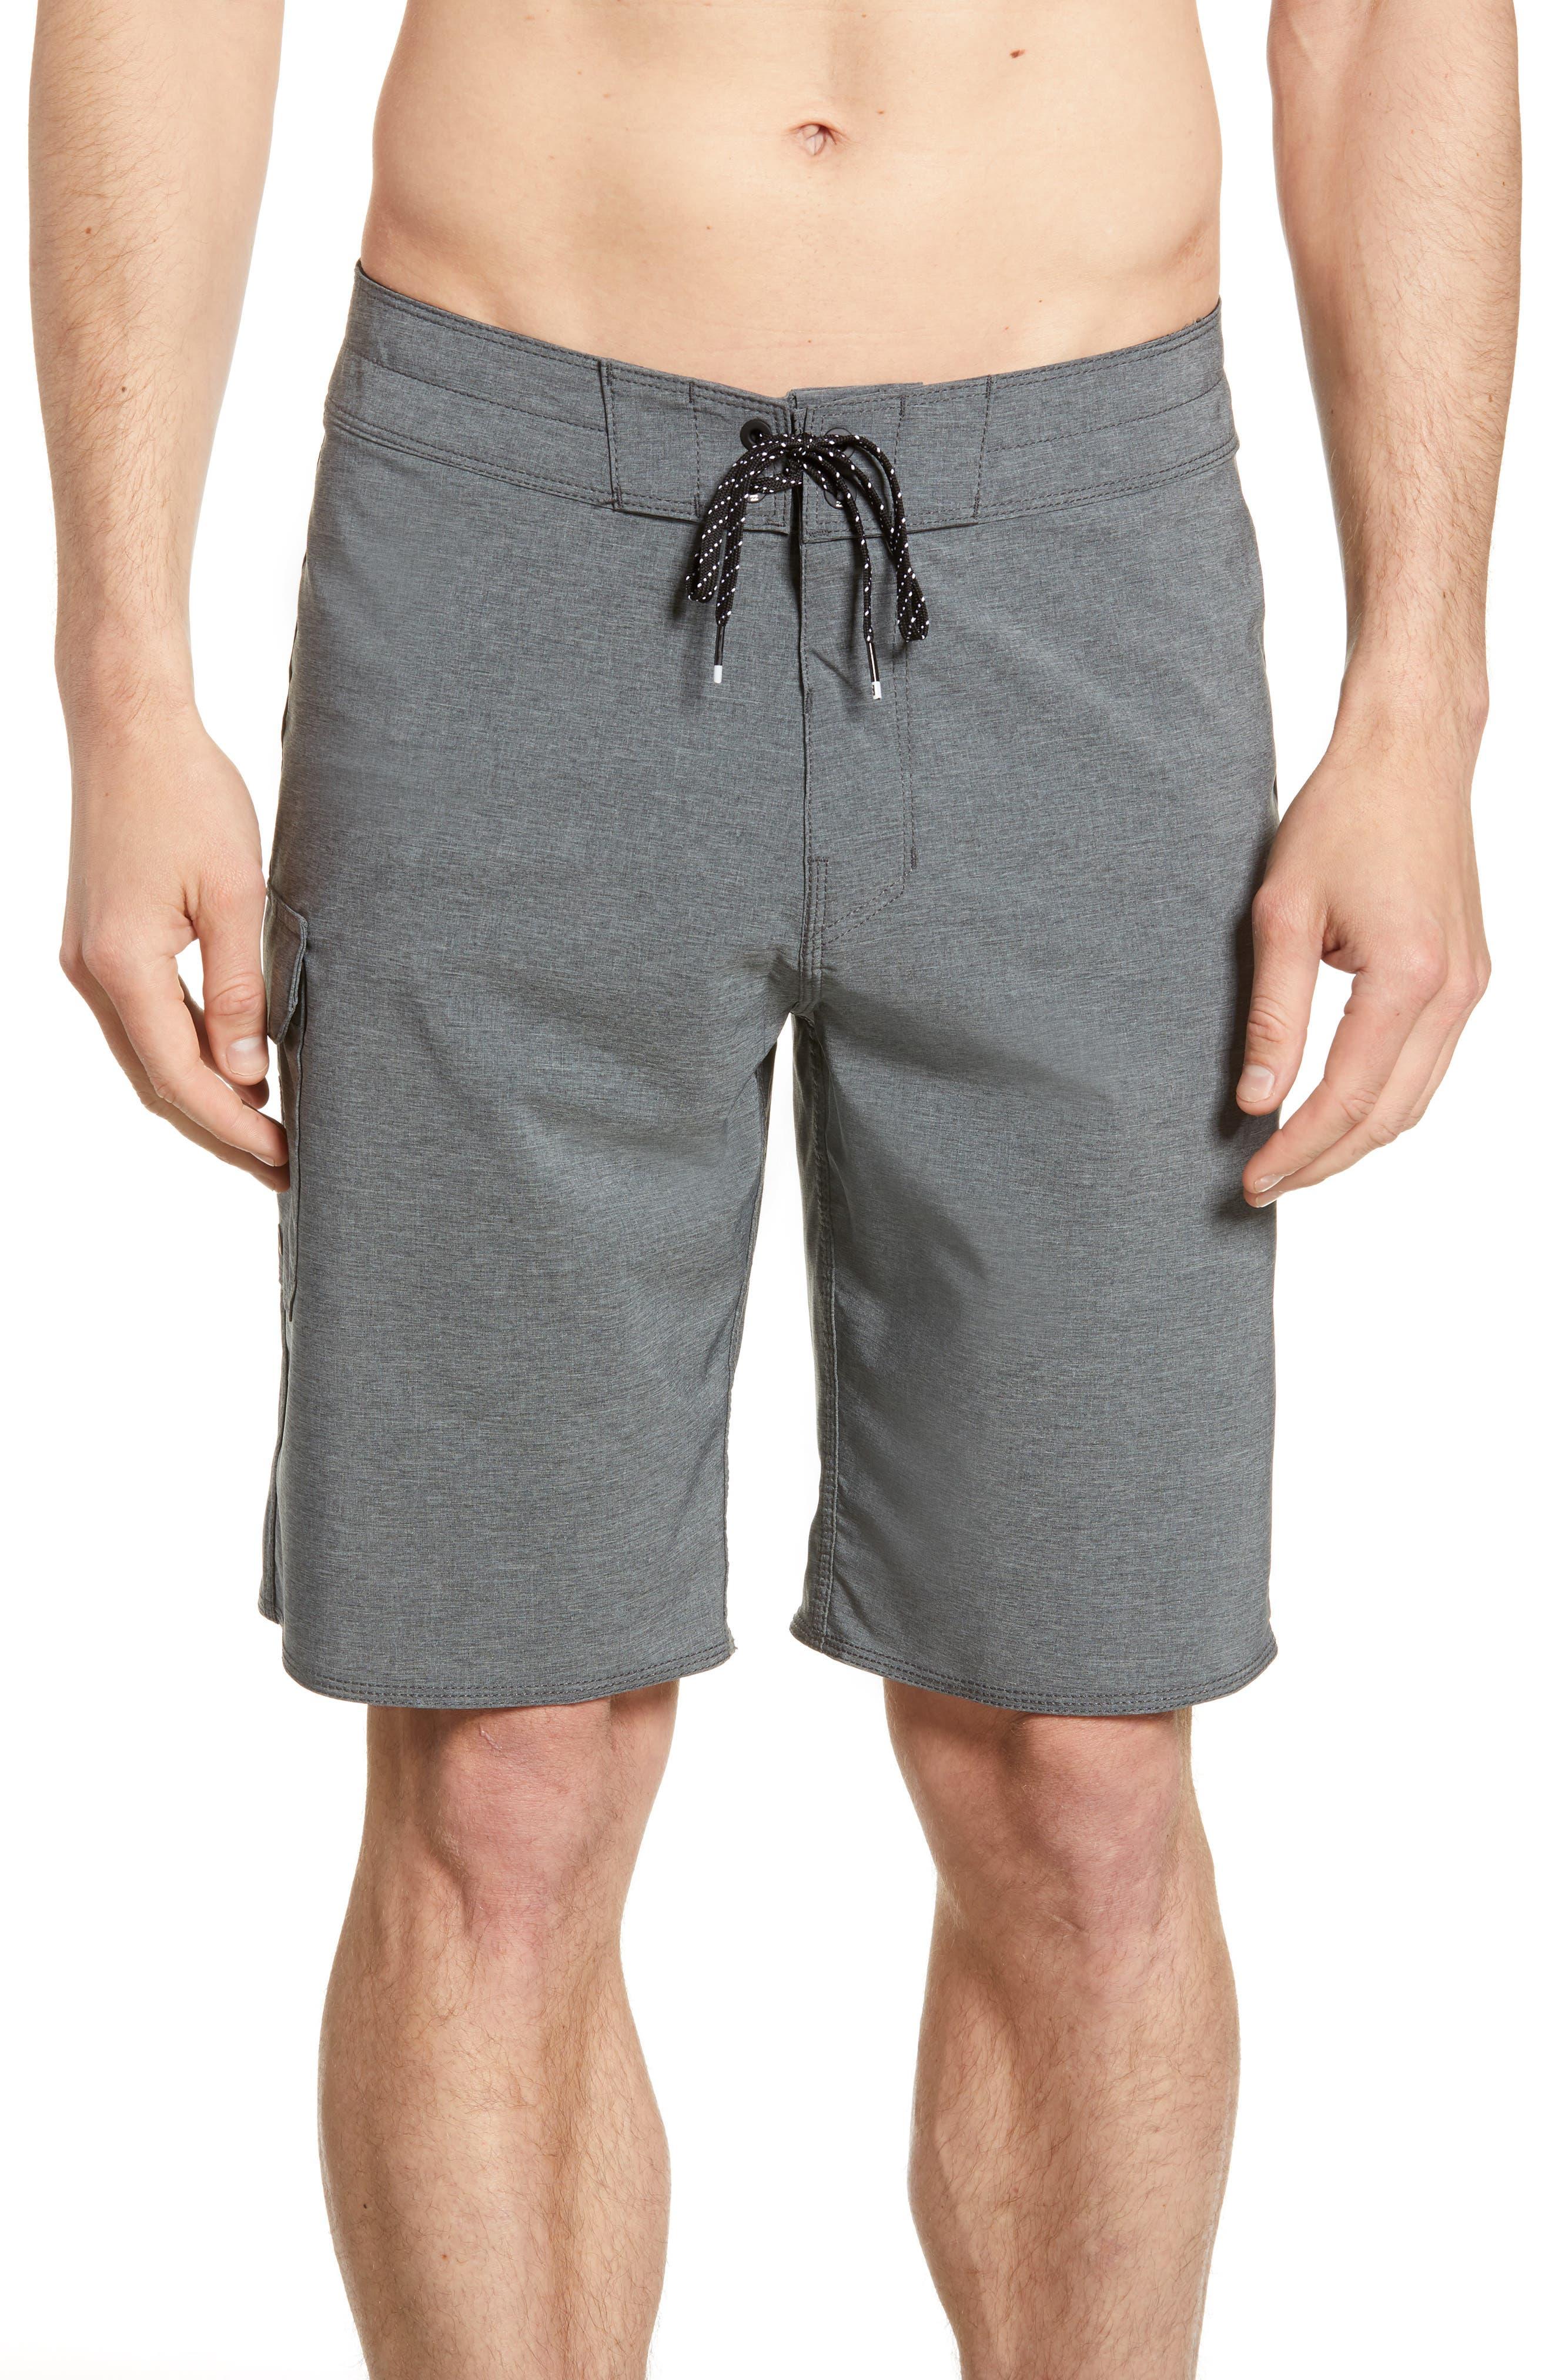 Billabong All Day Pro Board Shorts, Grey